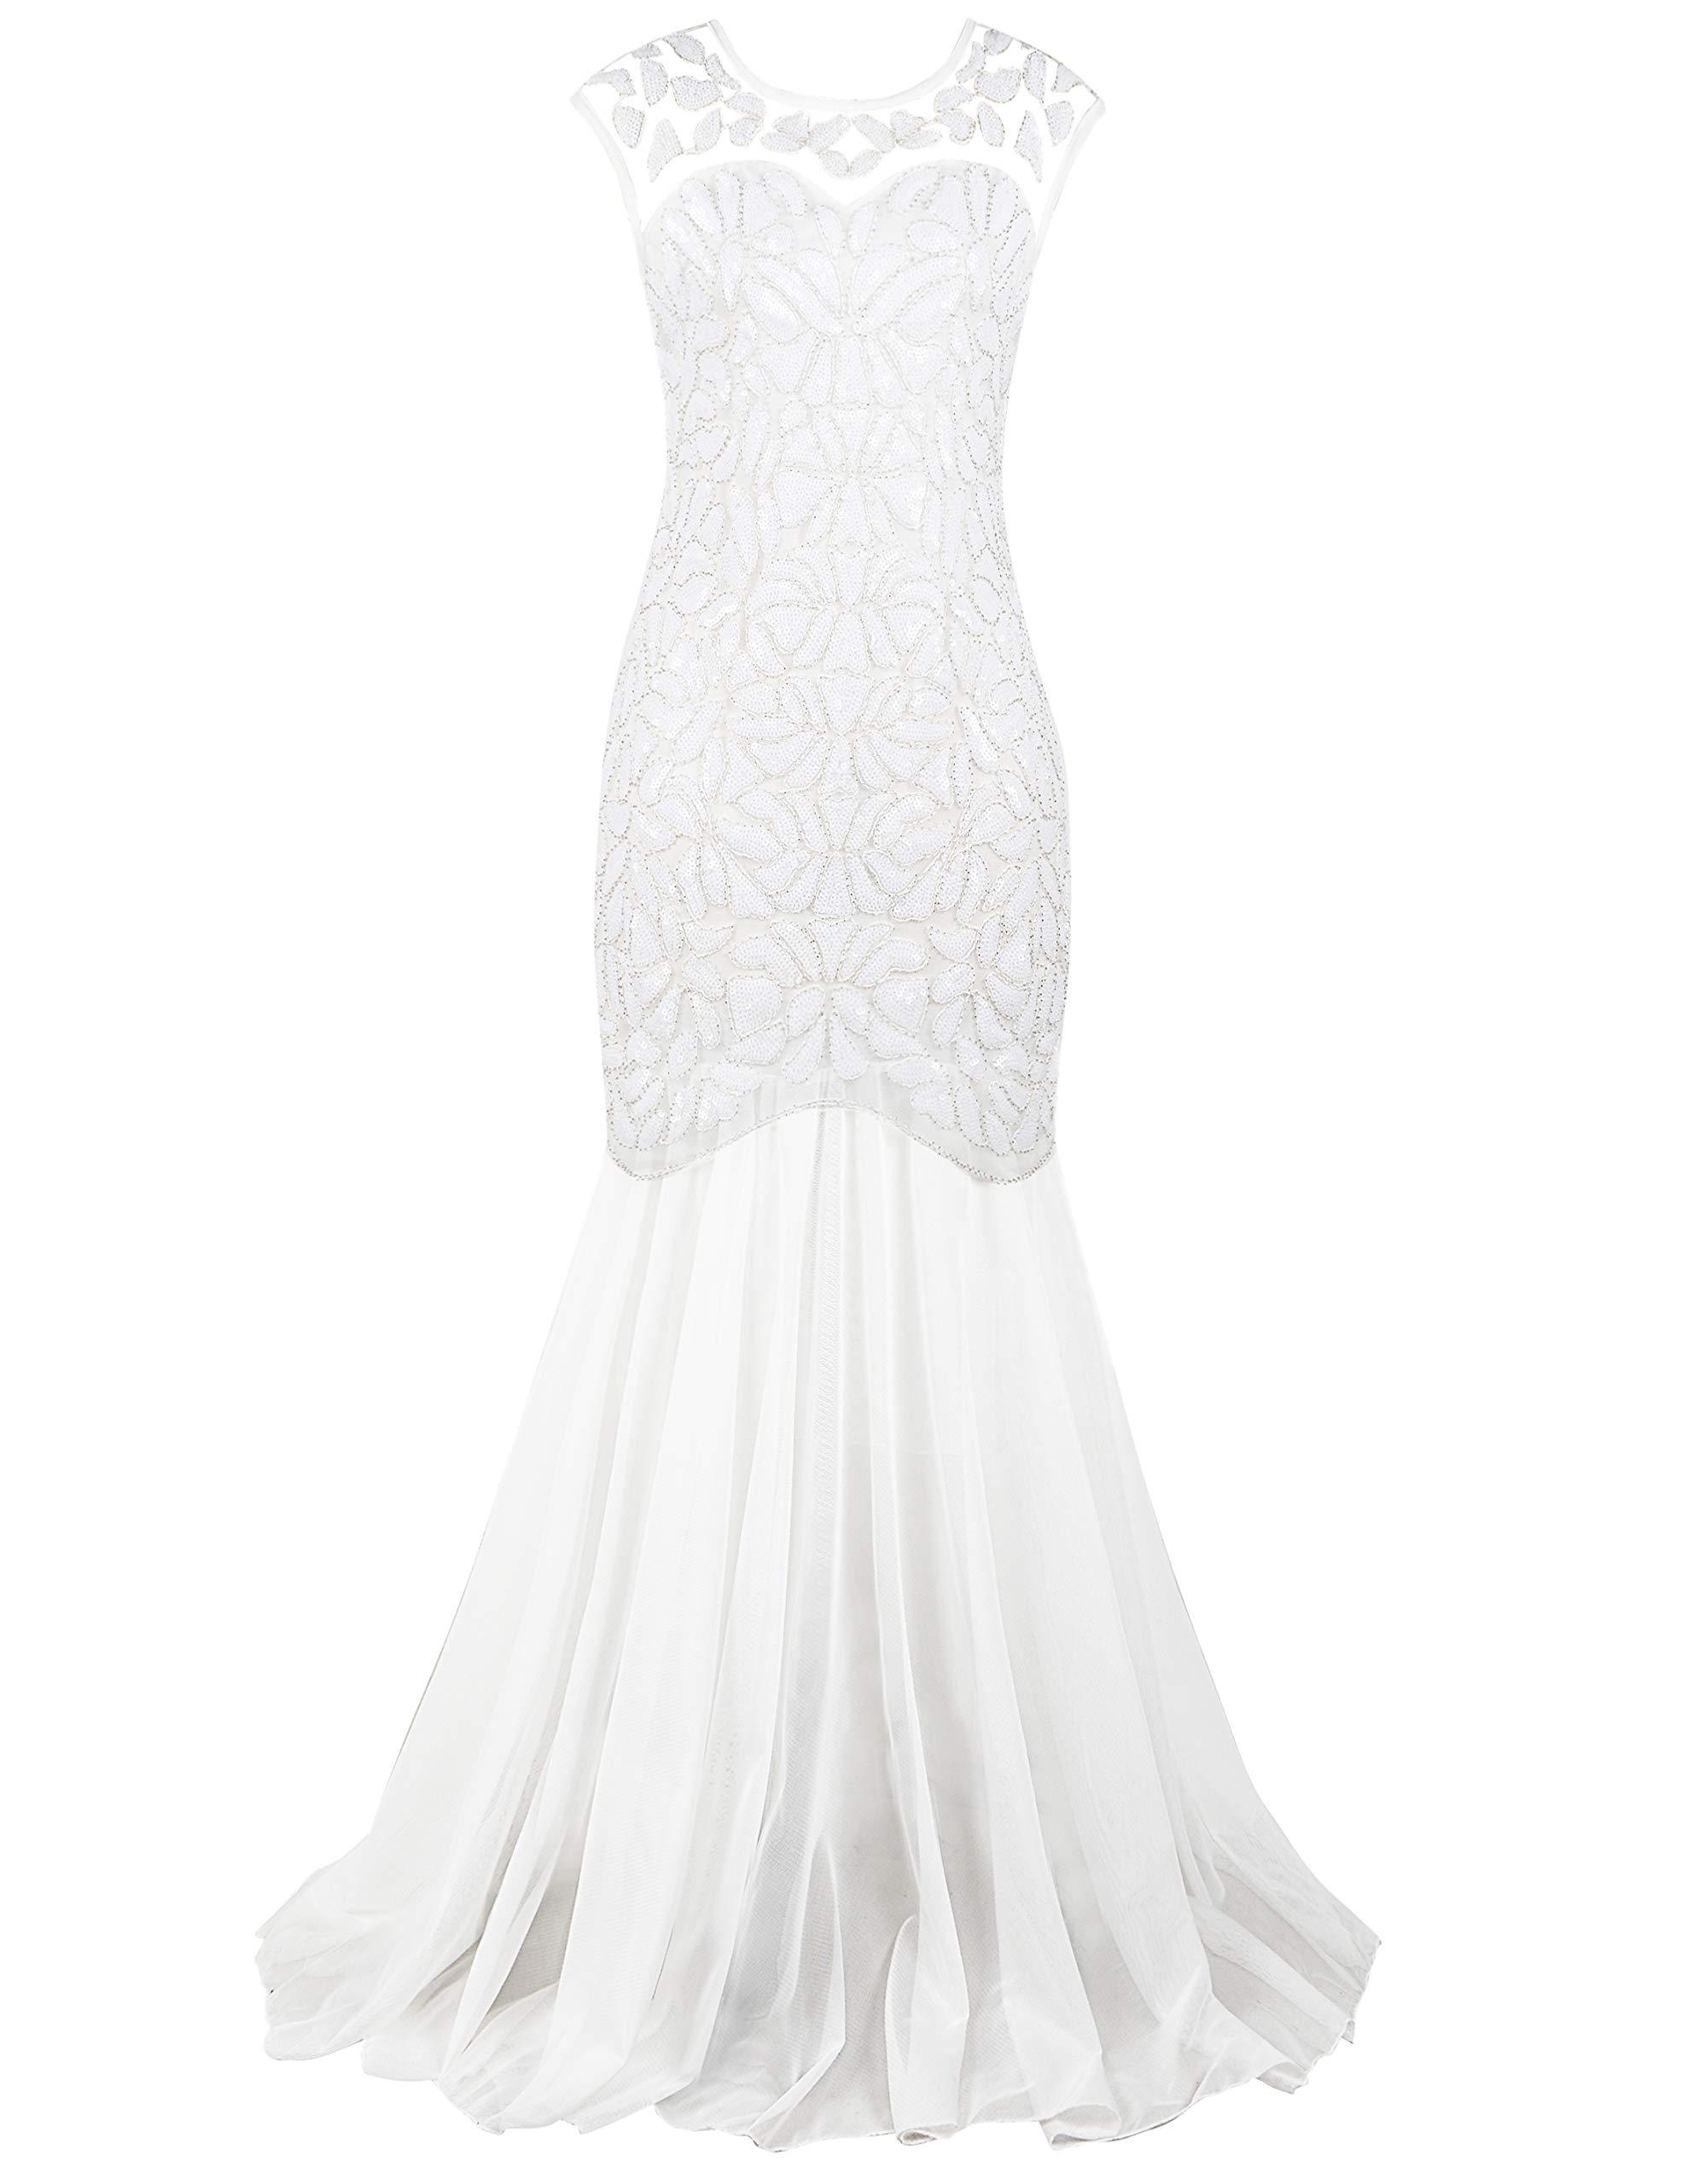 White Dress - Women Off Shoulder Floral Lace Twin Set Dress